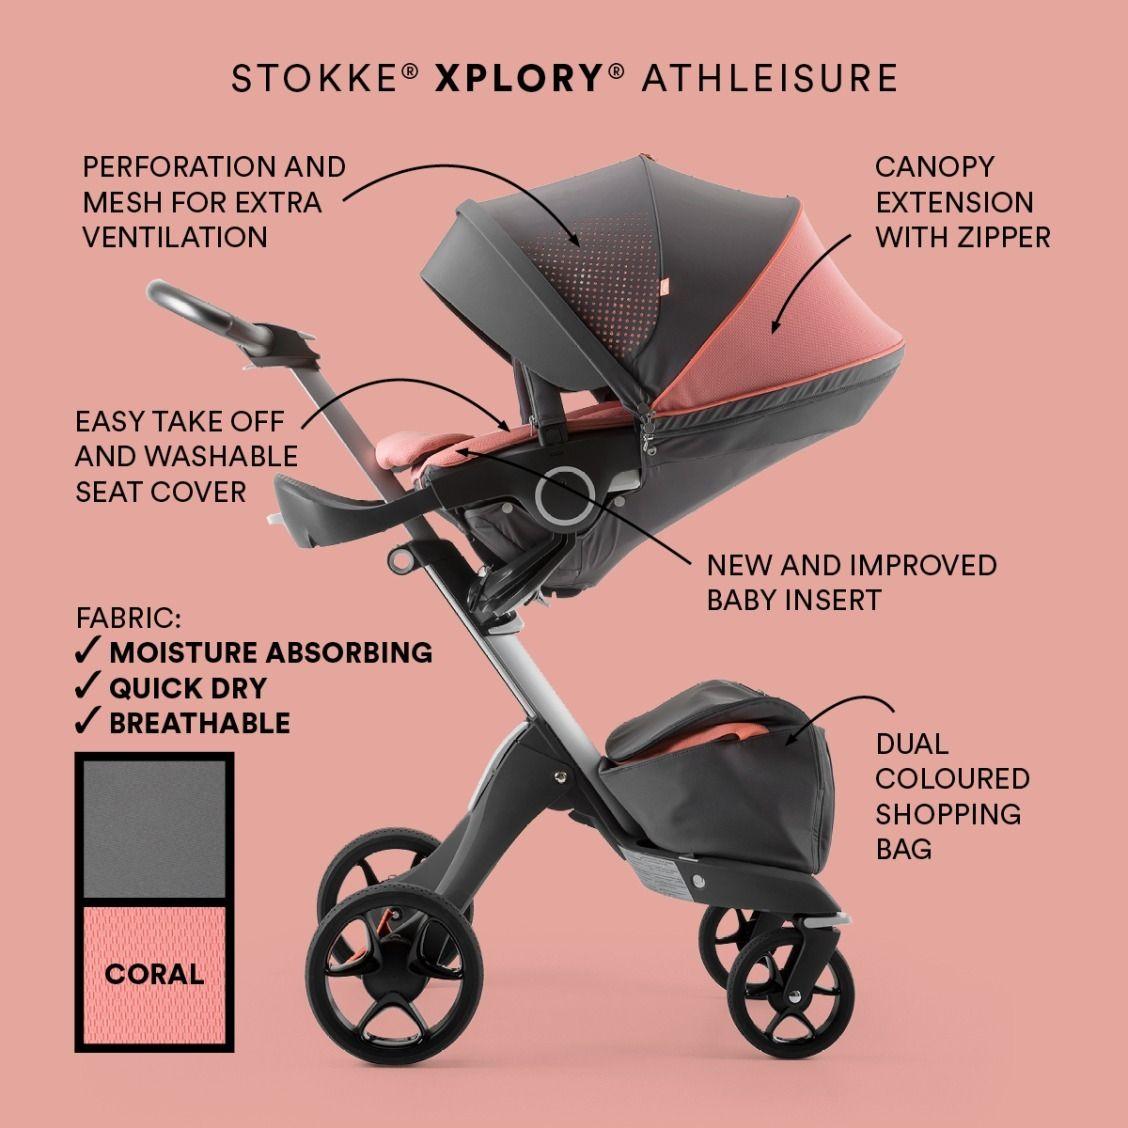 Stokke Xplory Athleisure Incorporates An Upgraded Newborn Insert